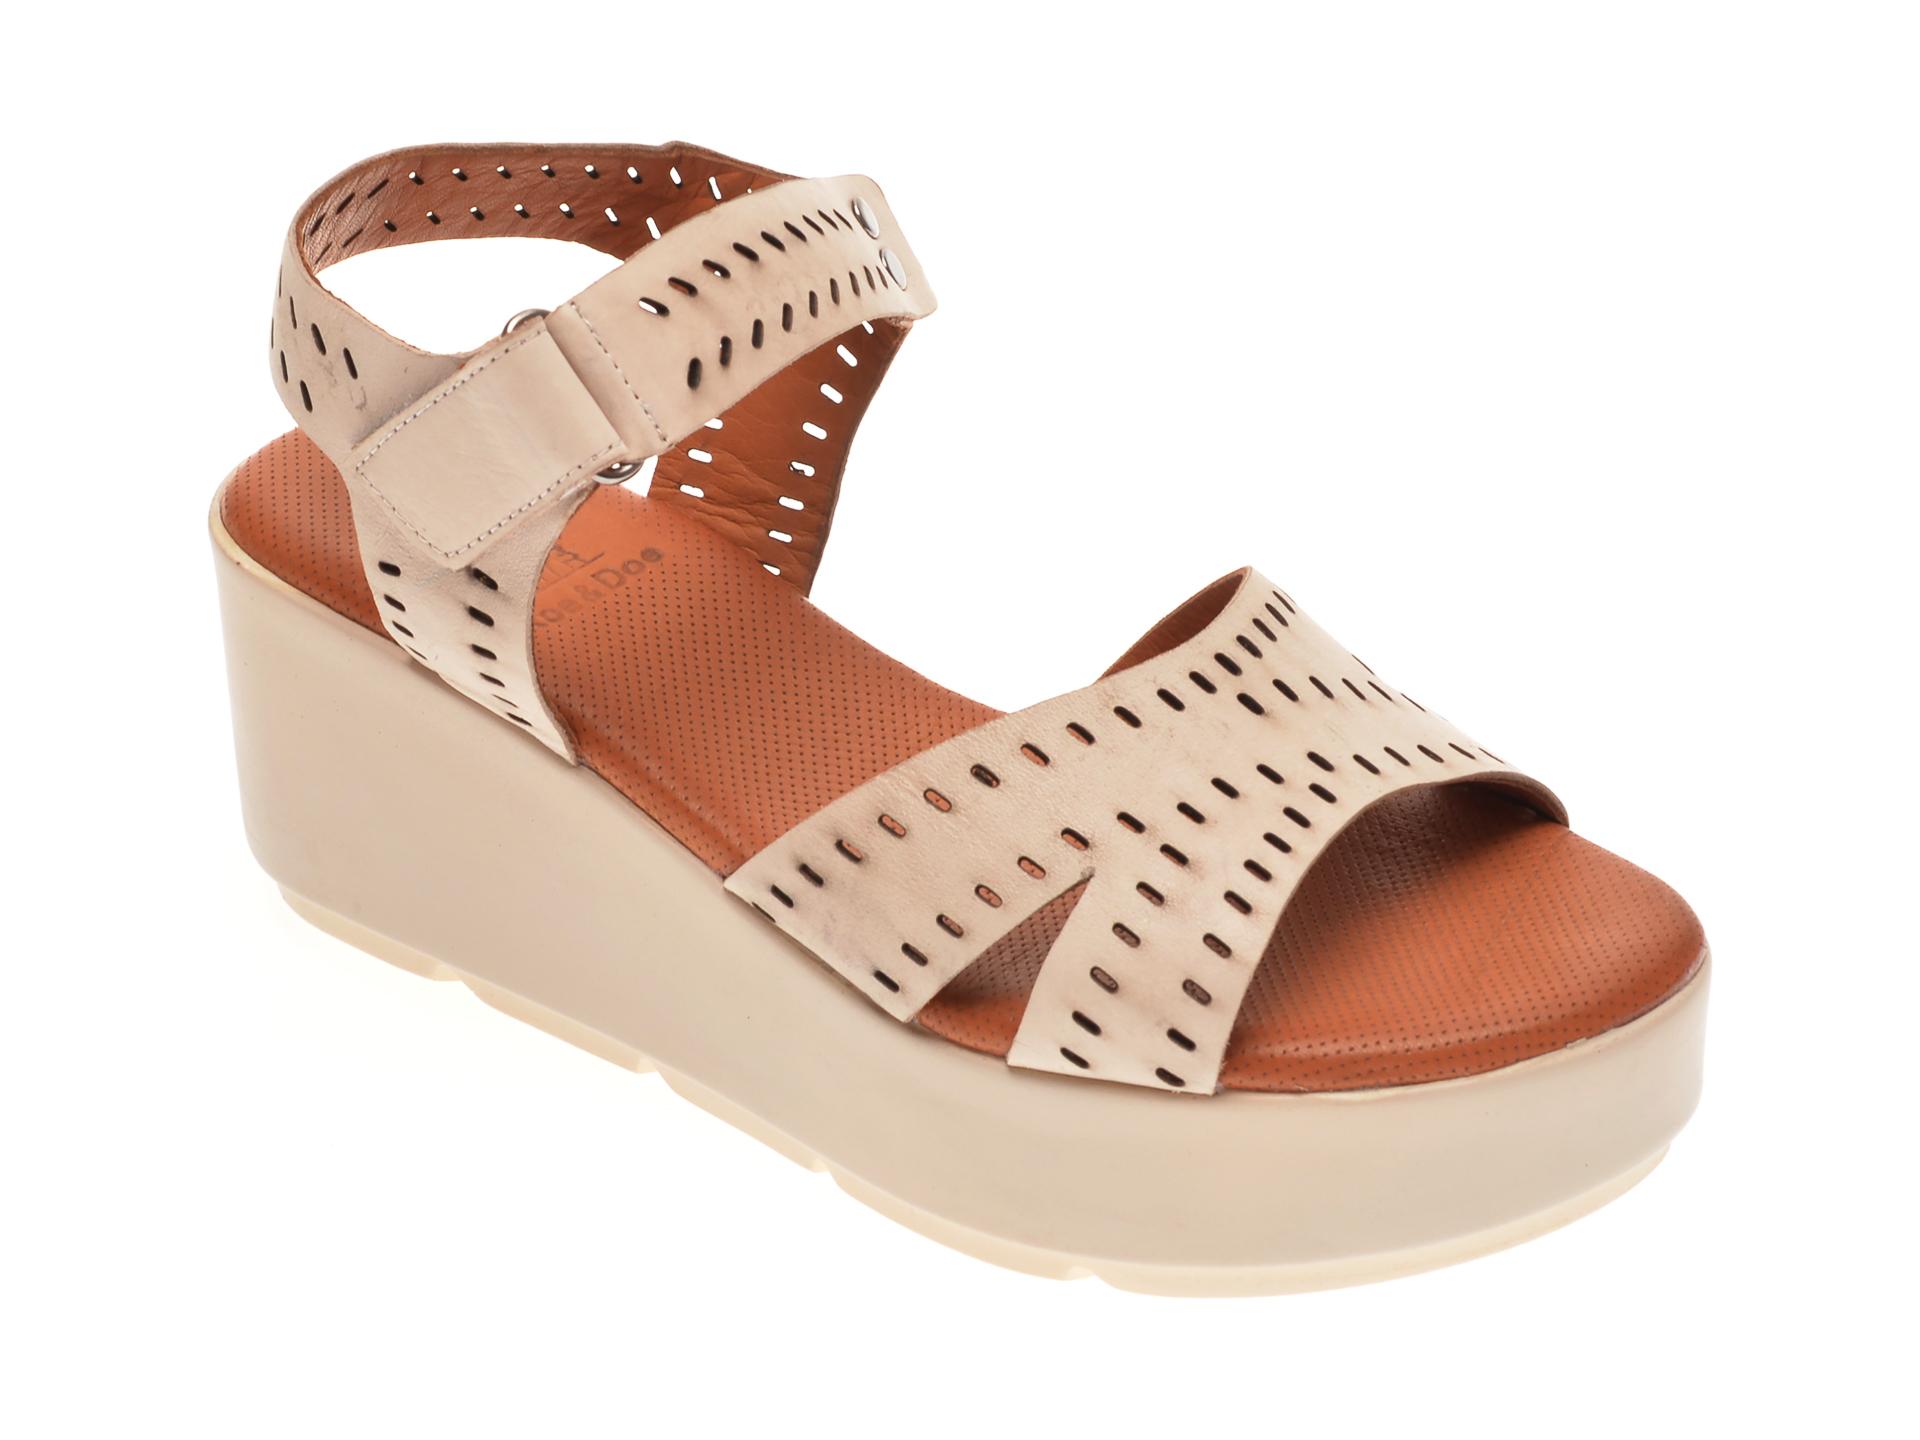 Sandale BABOOS bej, 2521, din piele naturala imagine